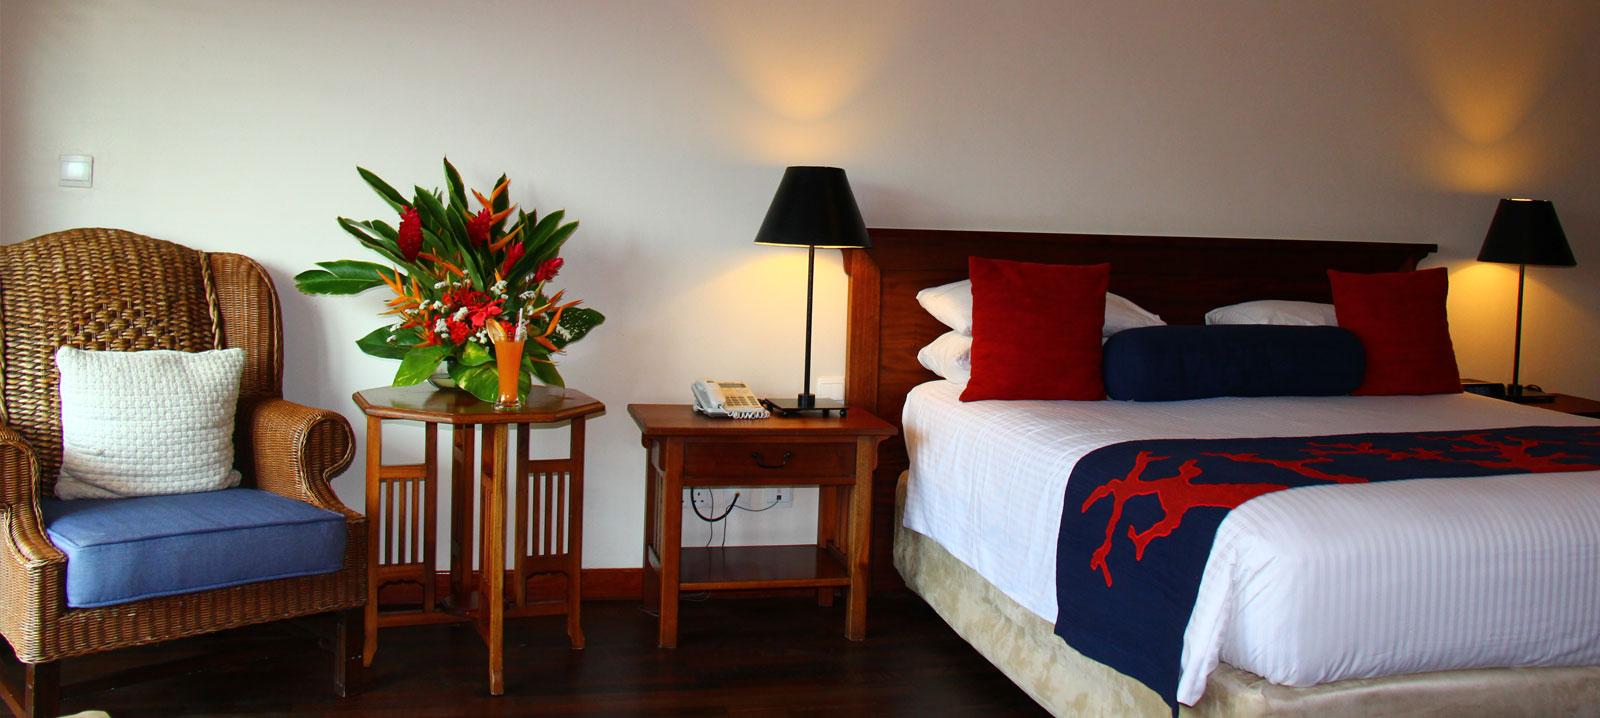 Best western coral beach hotel 123